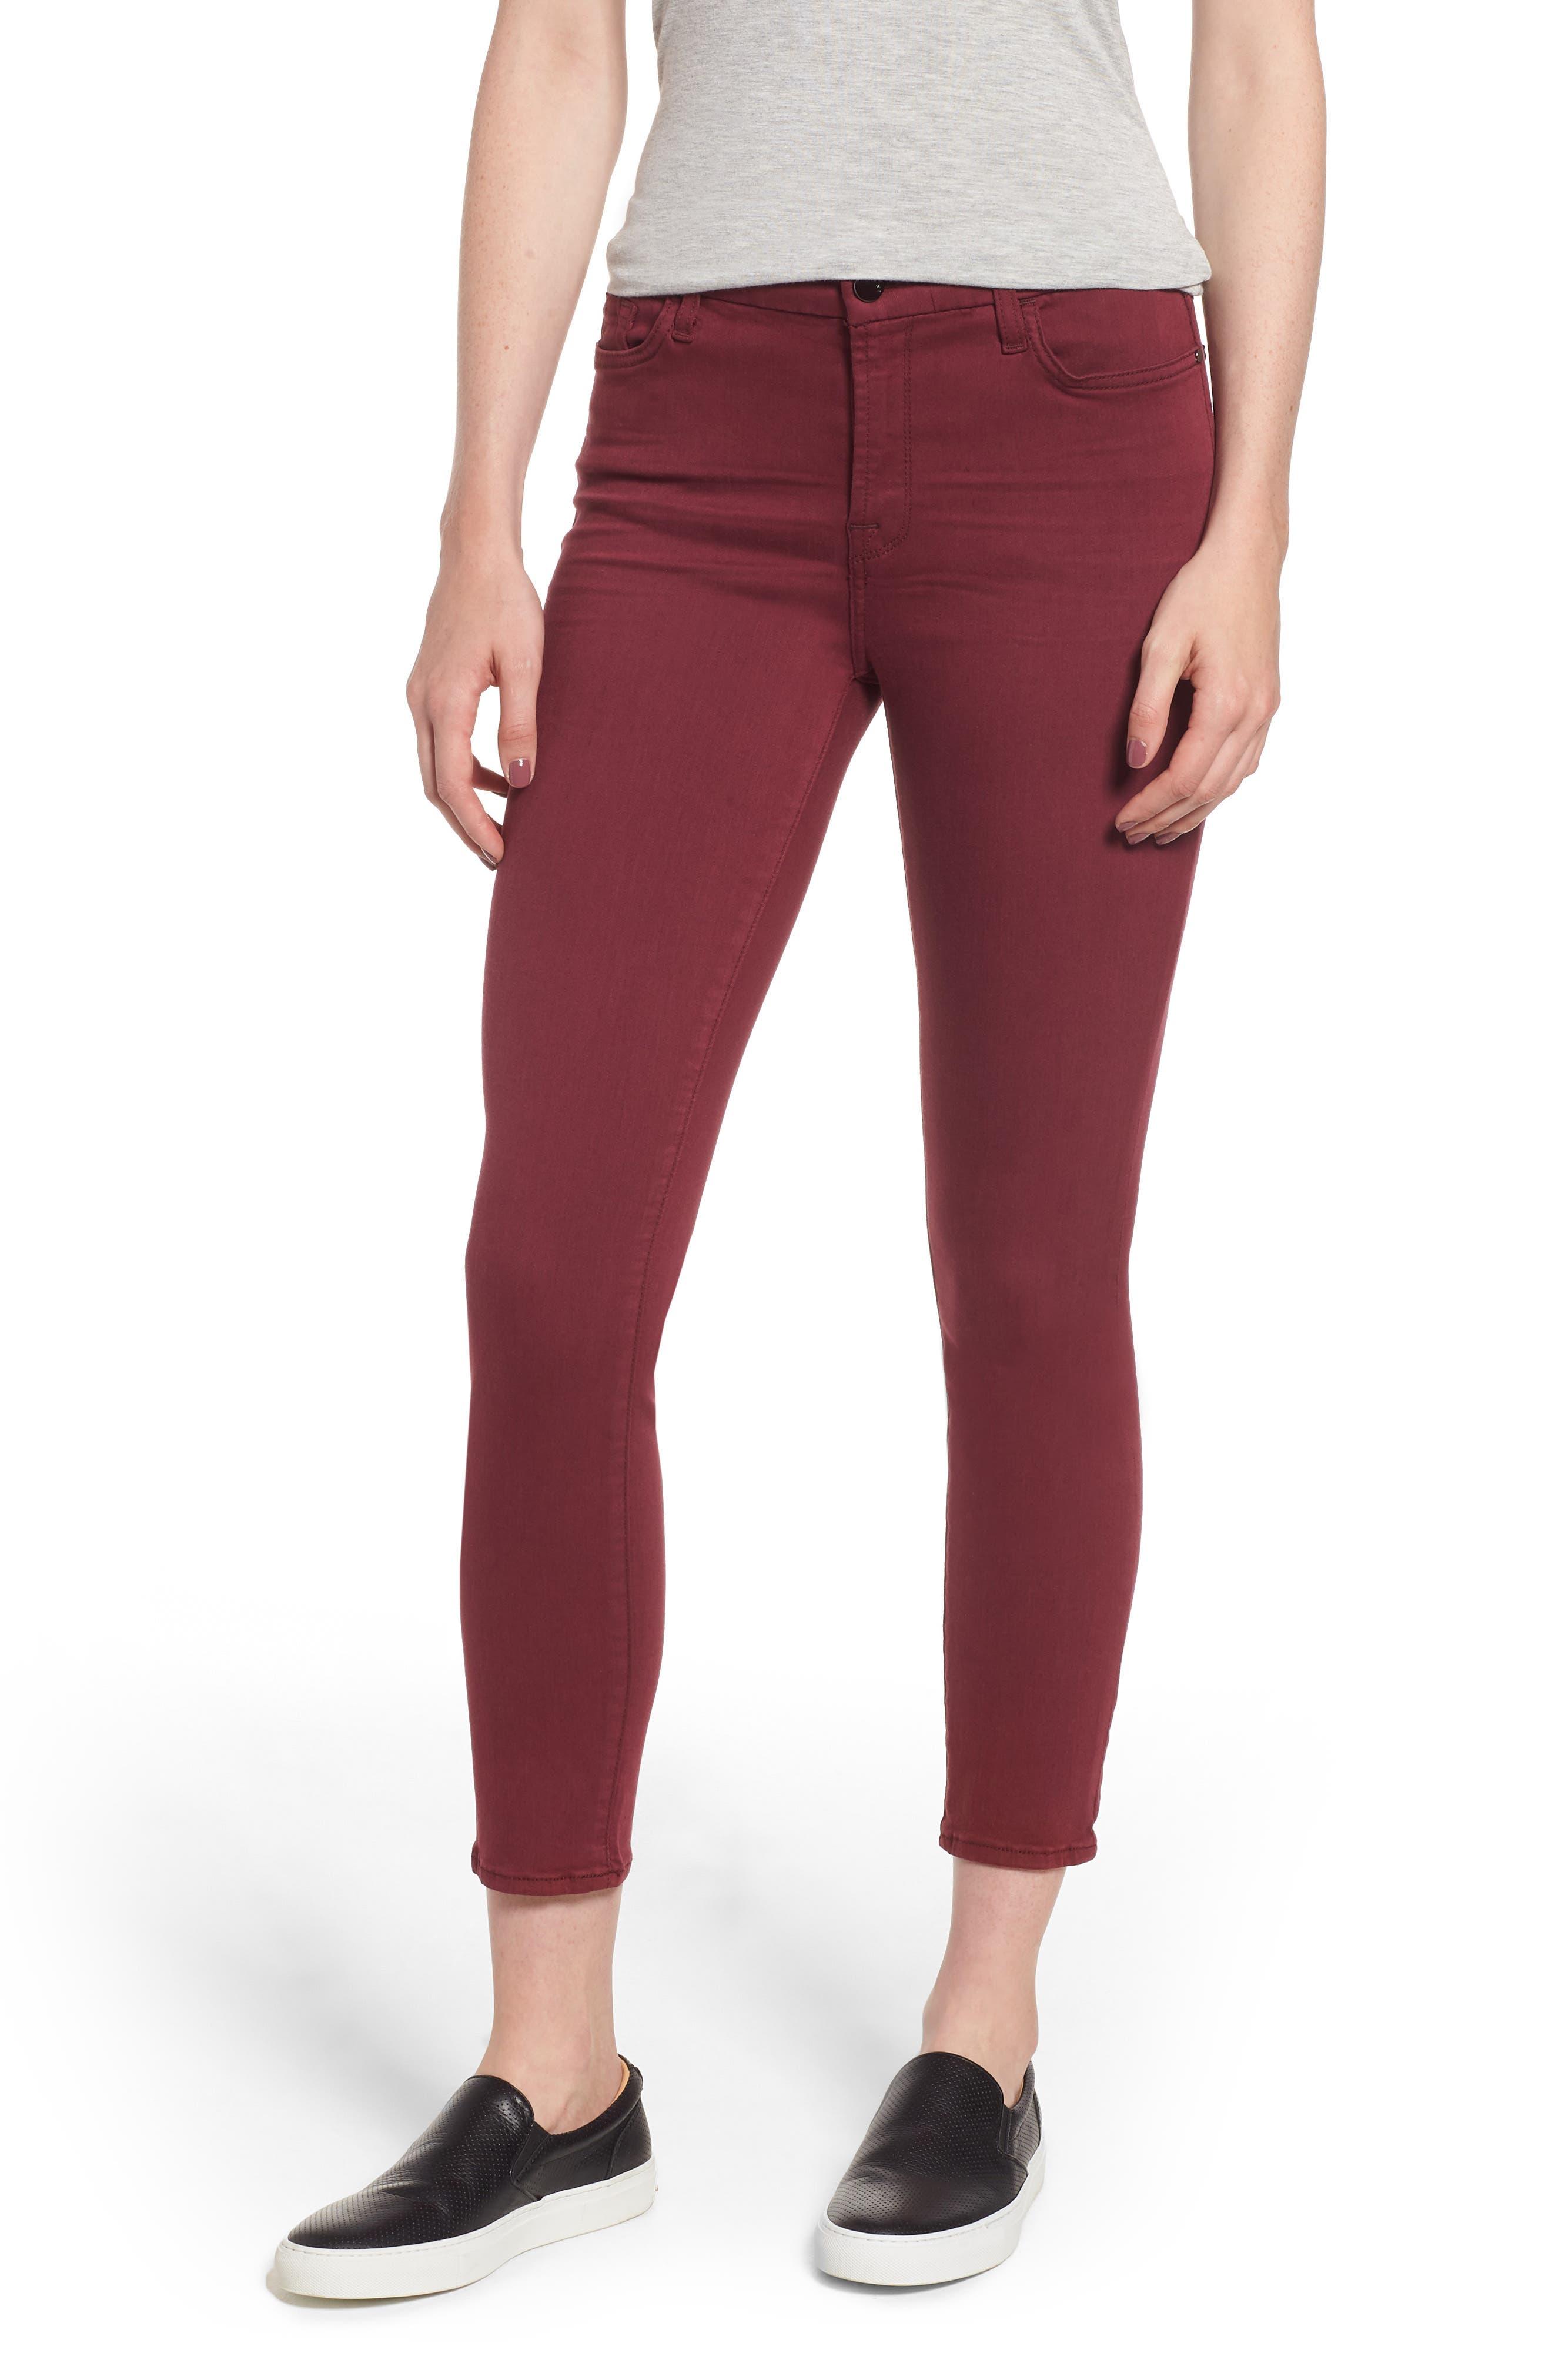 Mid-Rise Skinny Twill Pants W/ Unraveled Hem in Blackberry